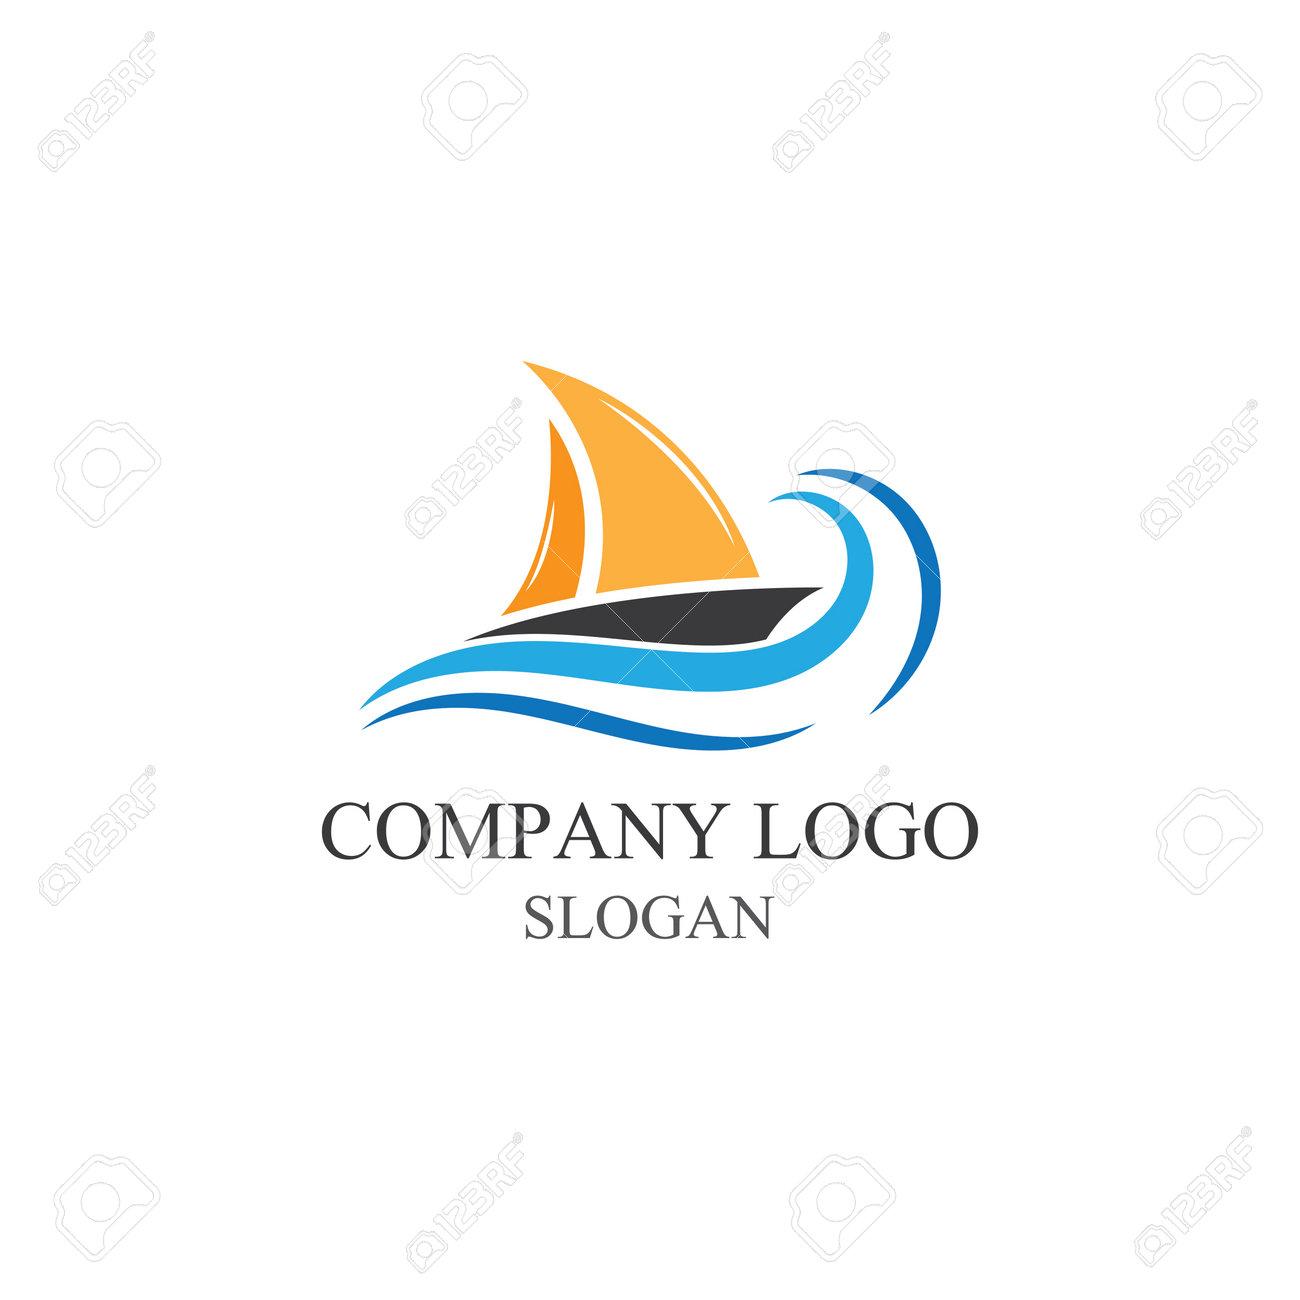 Traditional Sailboat logo design vector - 168445373